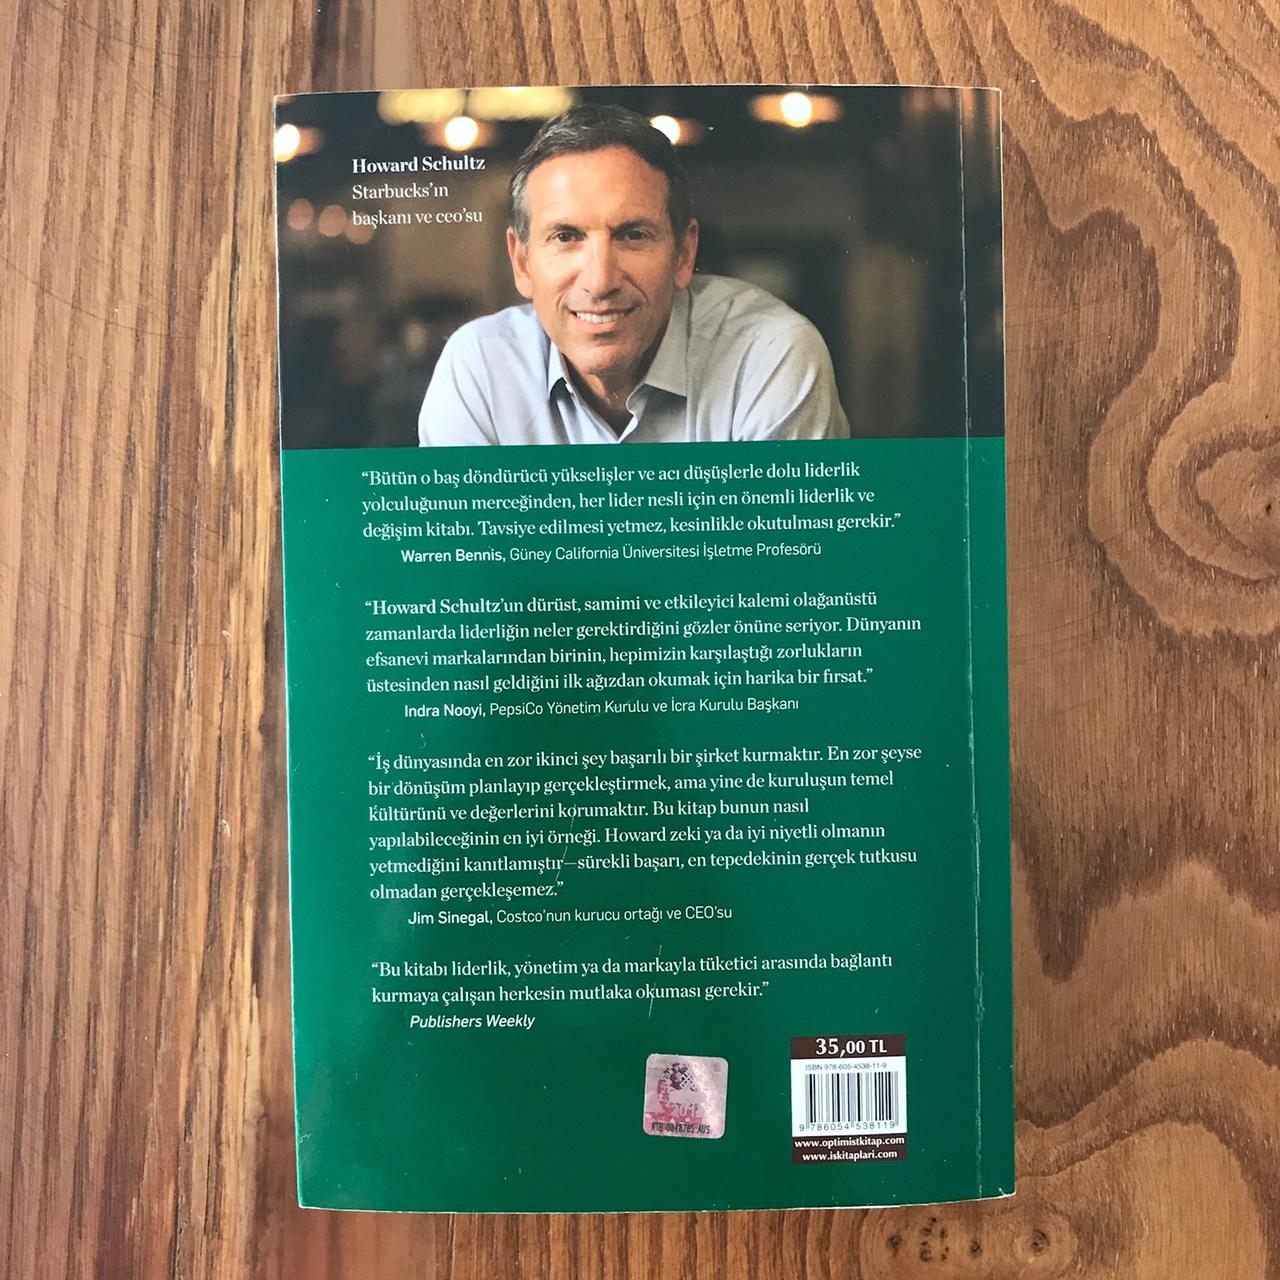 Onward - Starbucks (Kitap) Arka Kapak